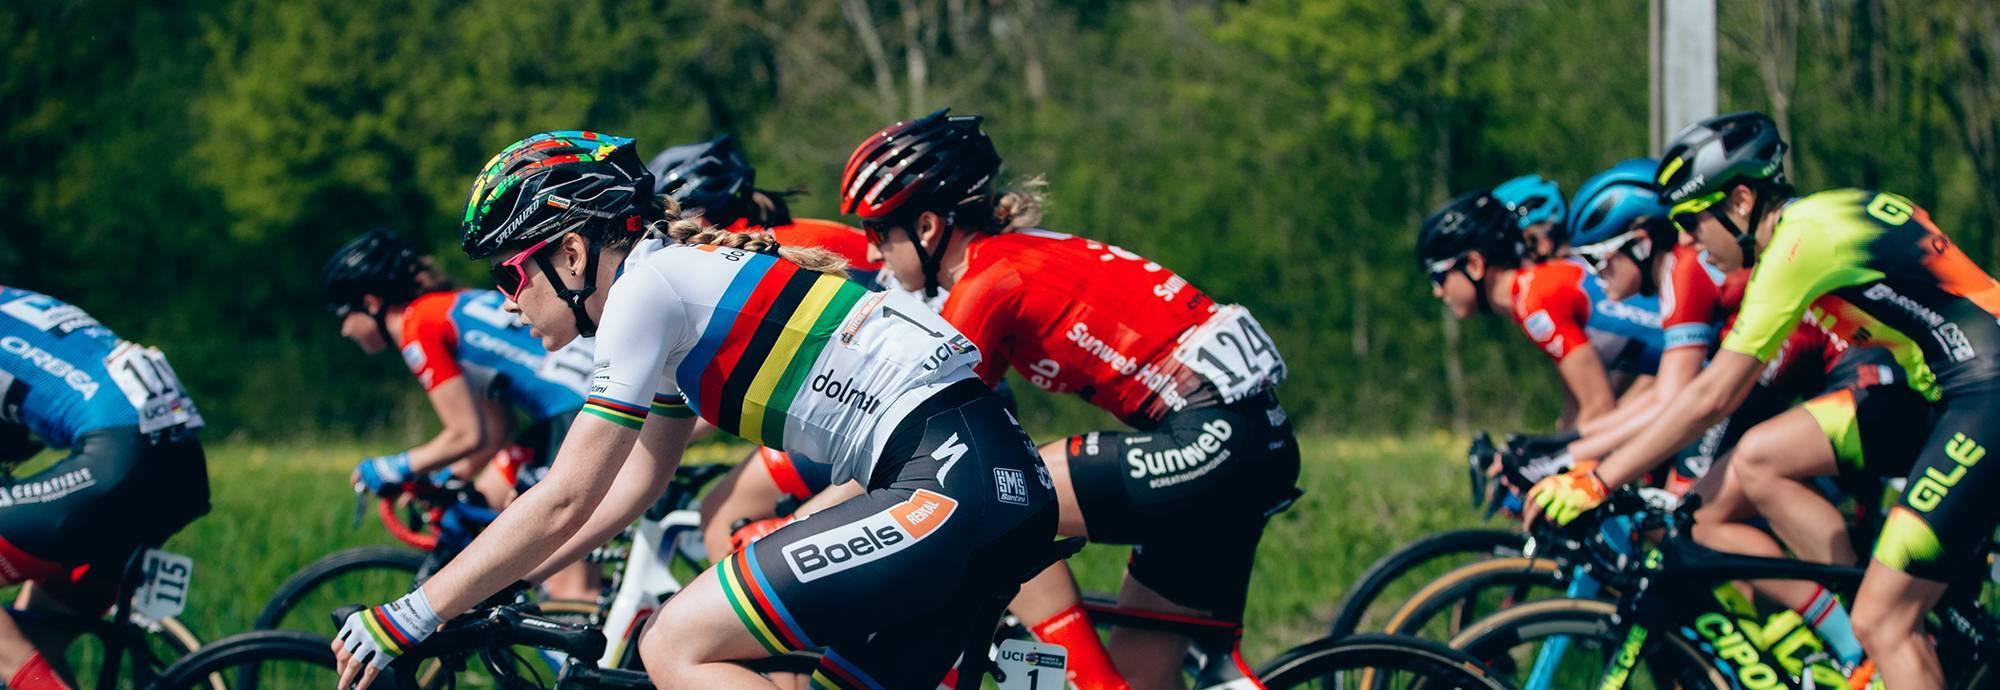 Header: DOLTCINI - VAN EYCK SPORT UCI WOMEN CYCLING